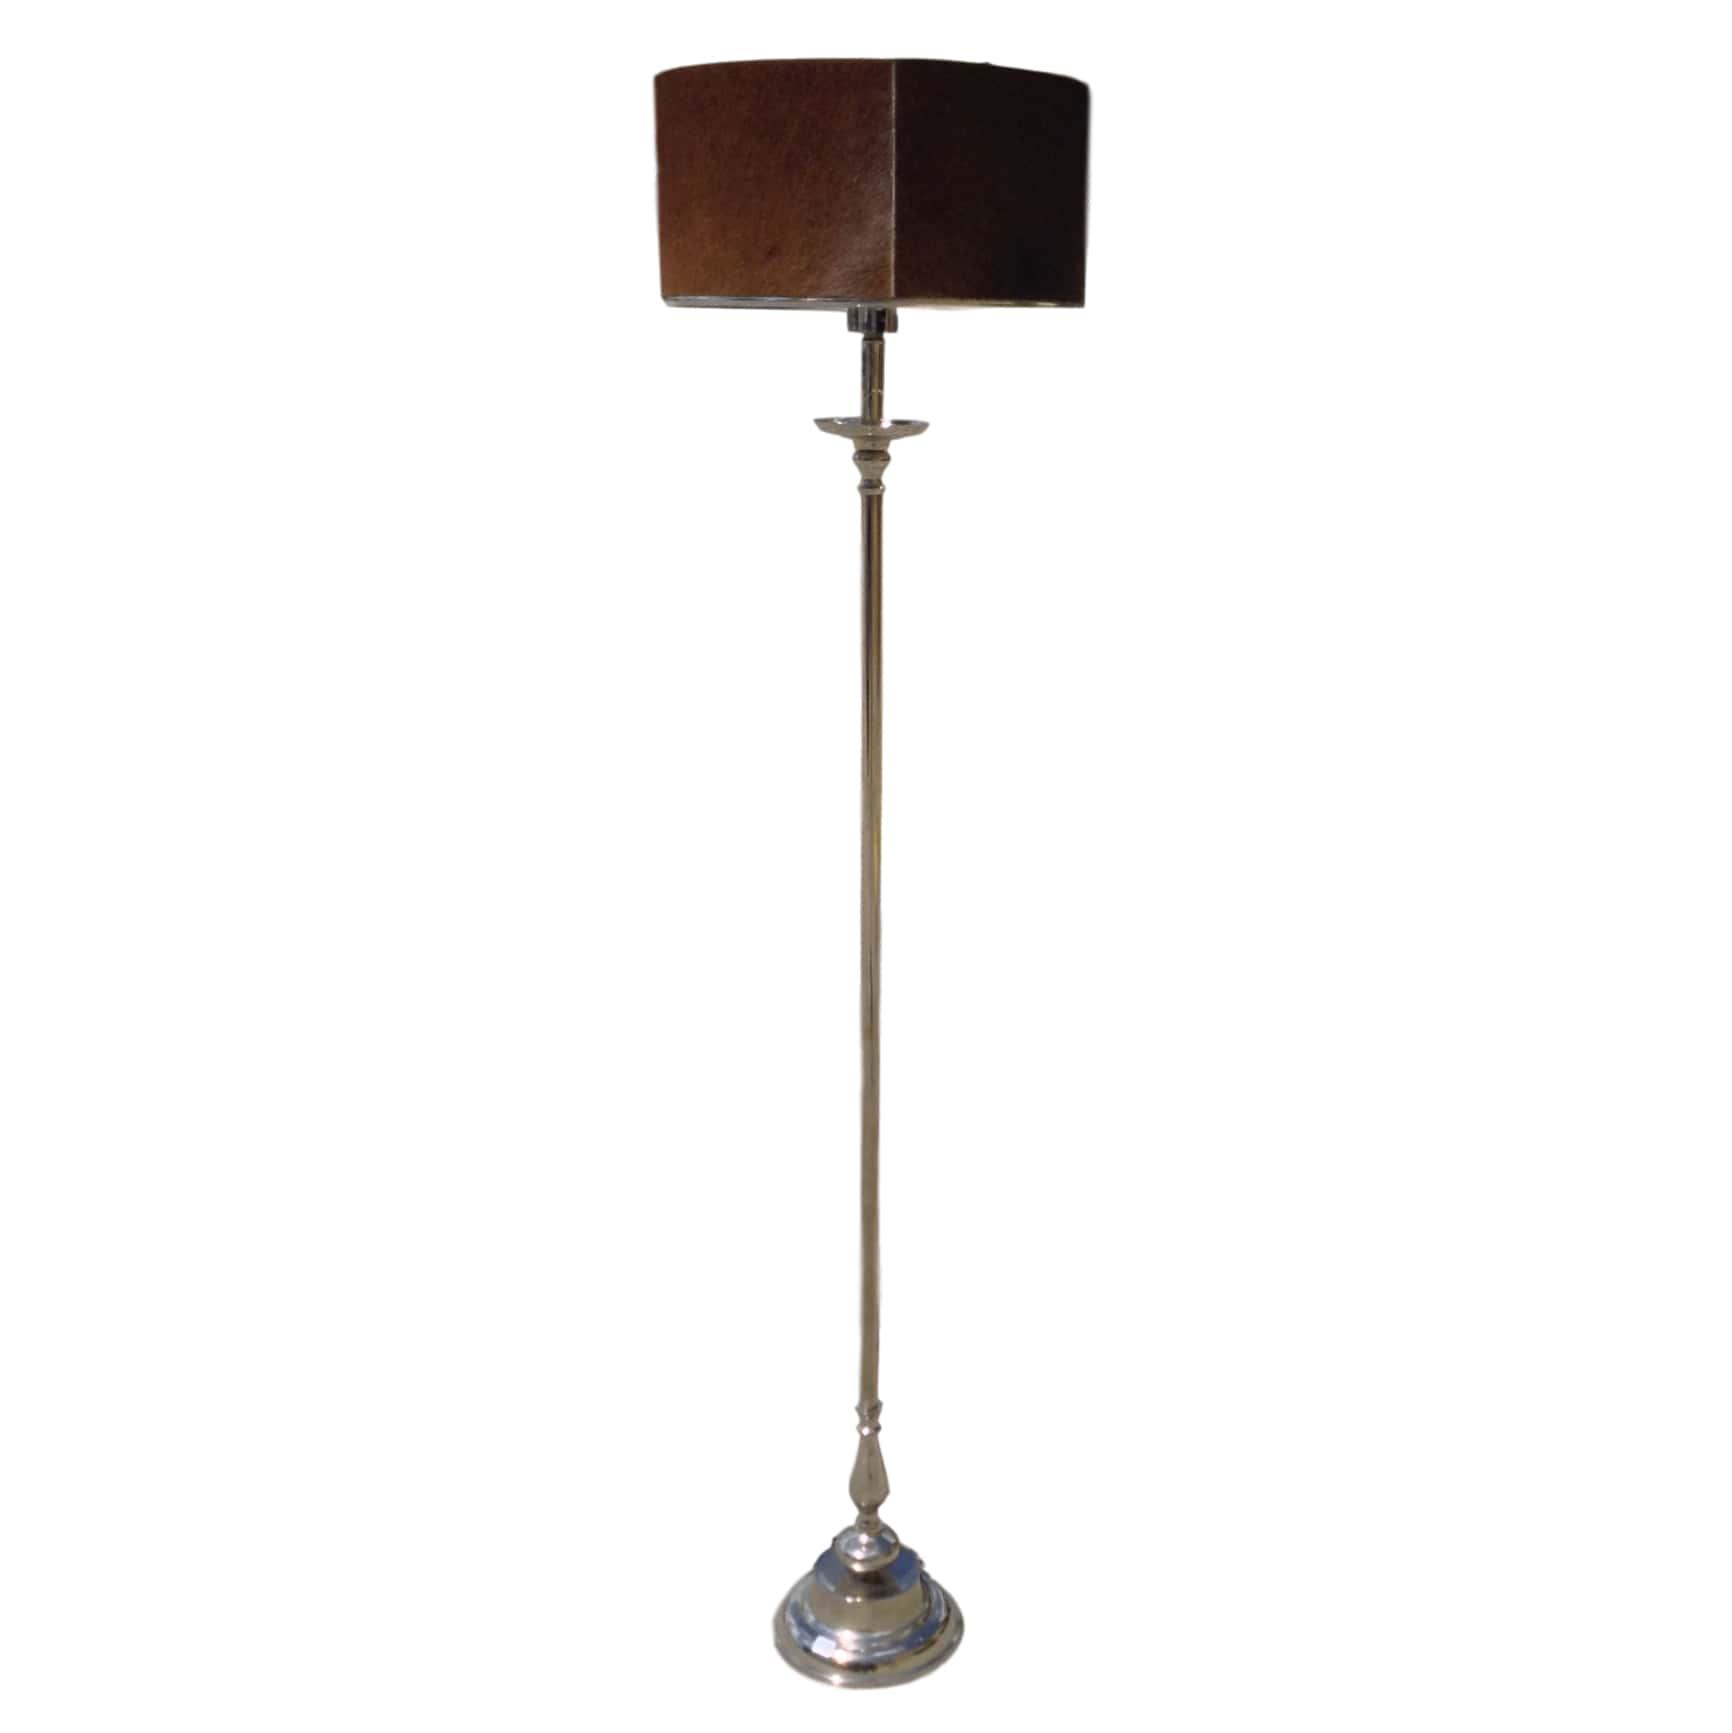 Silver Floor Lamp W Cowhide Shade_74836A